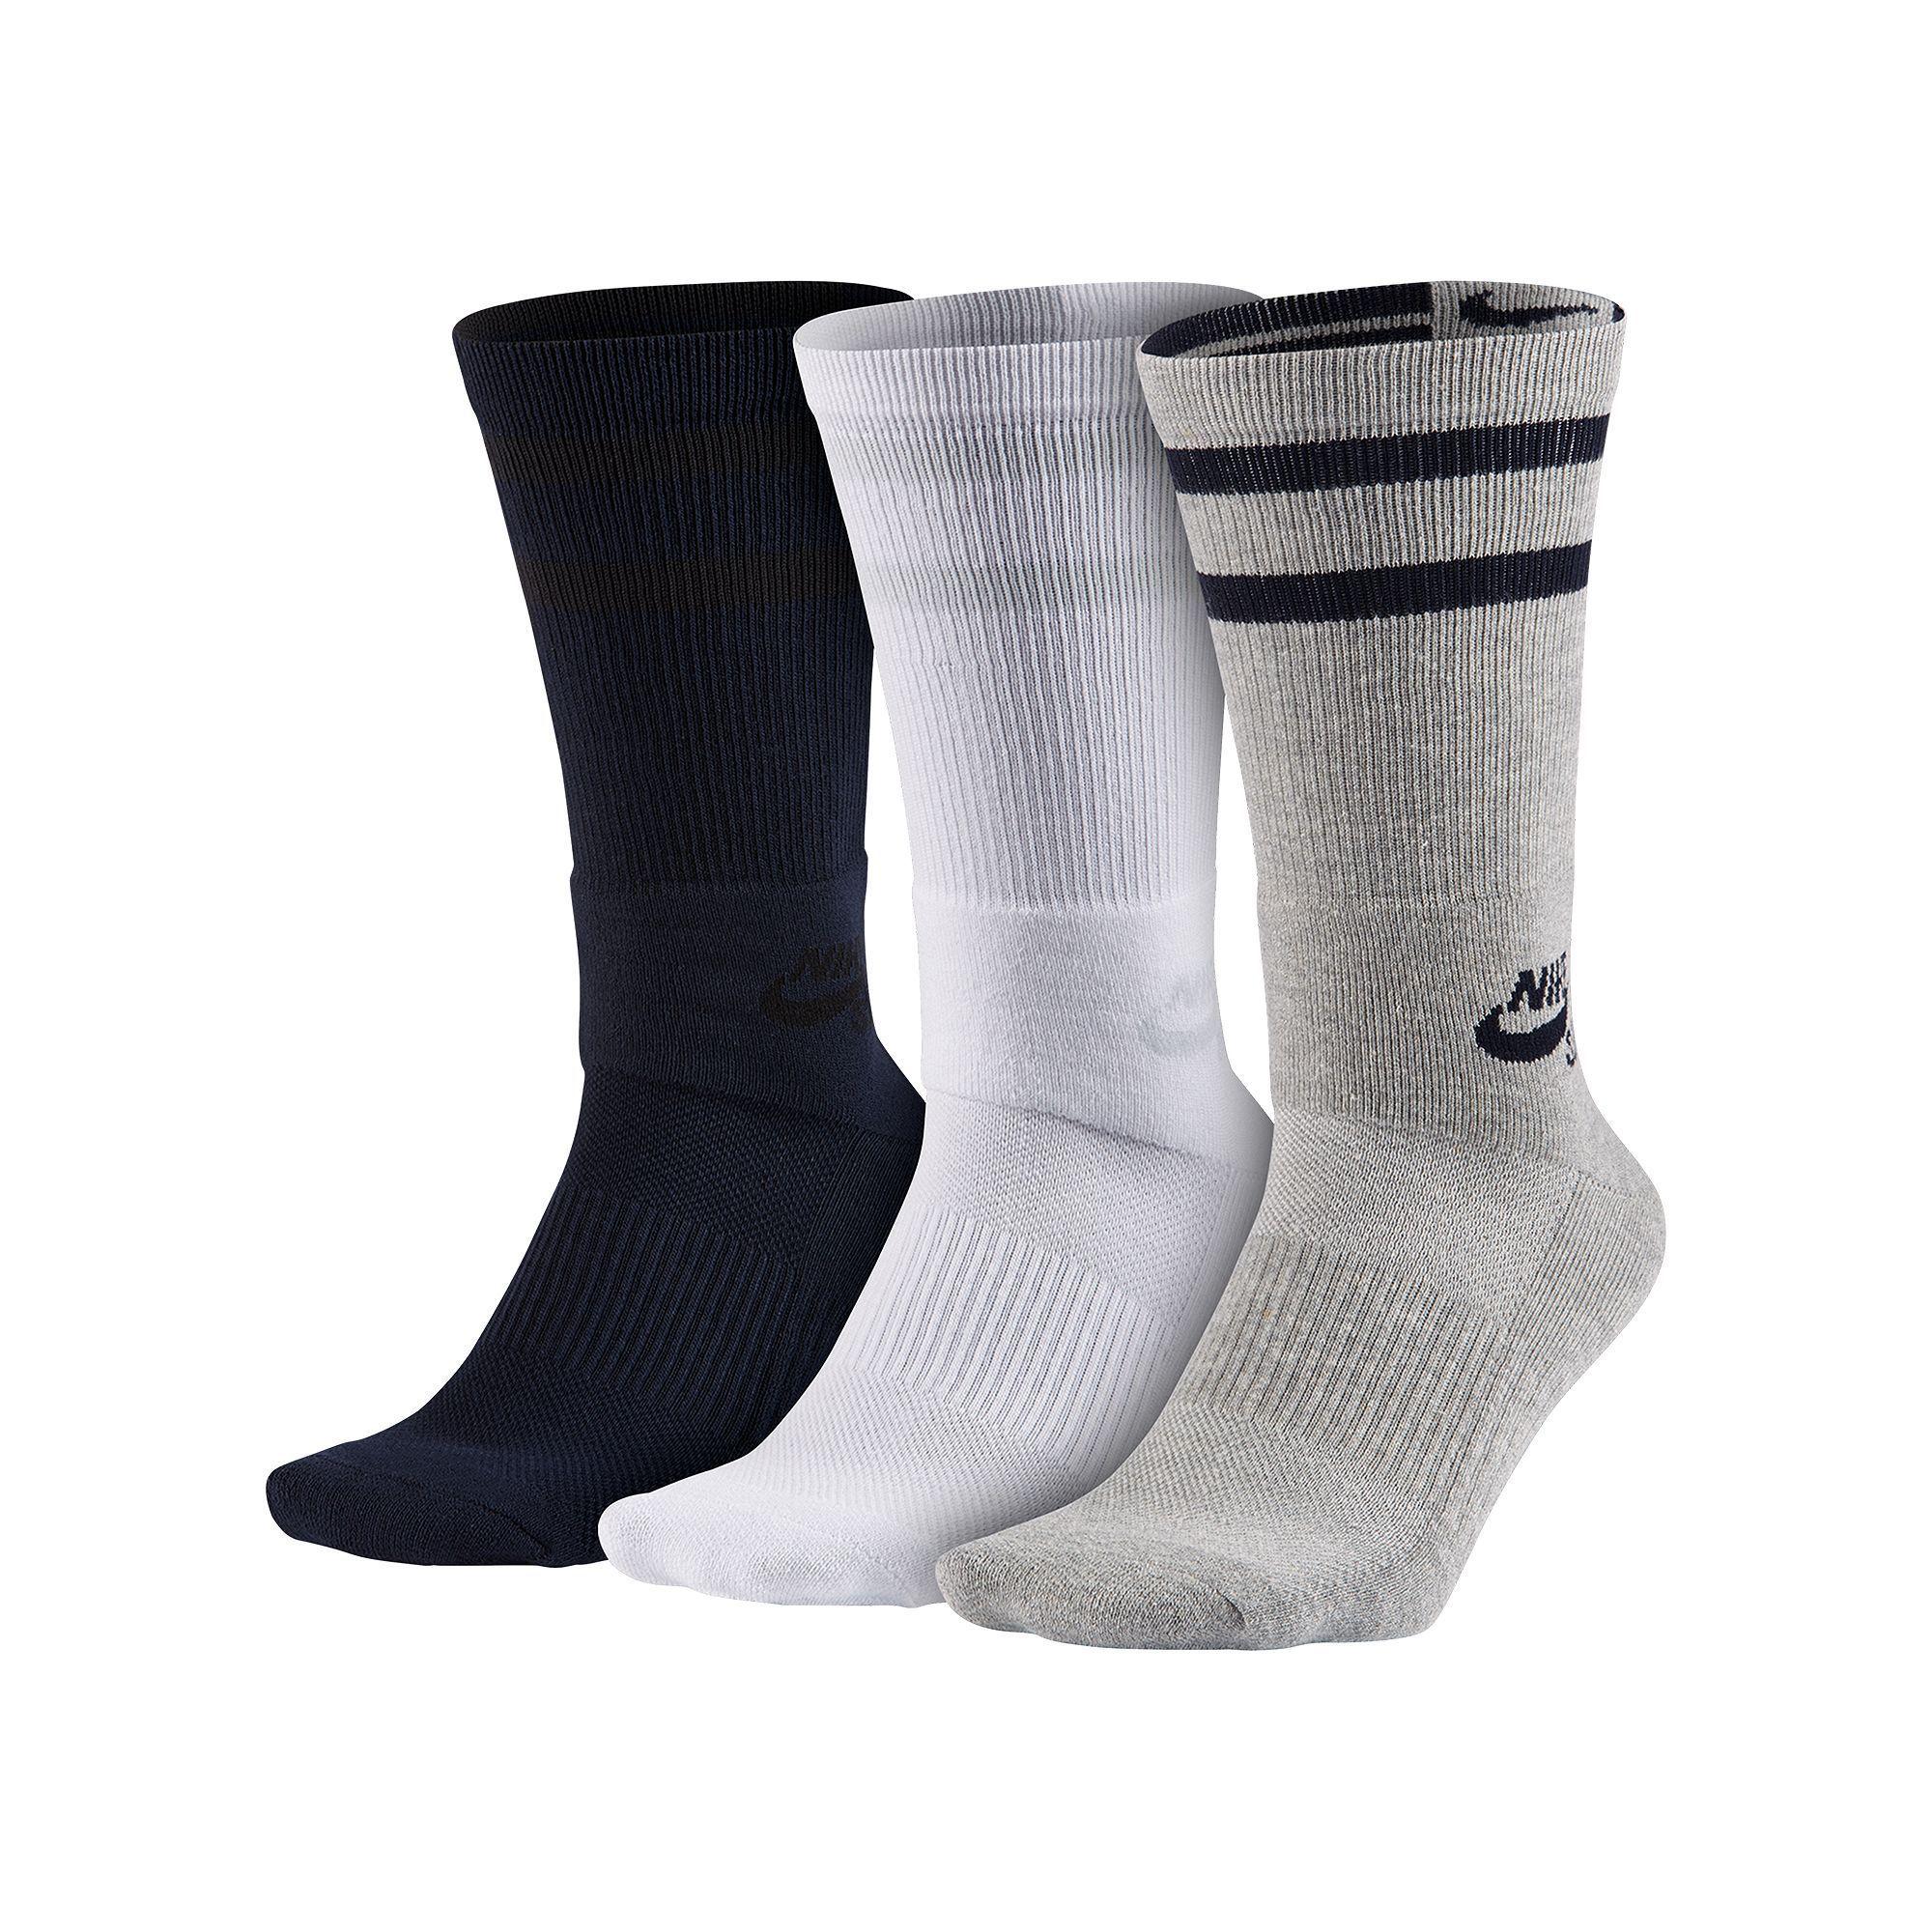 c77a8e3b1172 Men's Nike 3-pack Dri-FIT Skateboard Performance Crew Socks, Size: 12-15,  Black Gray White